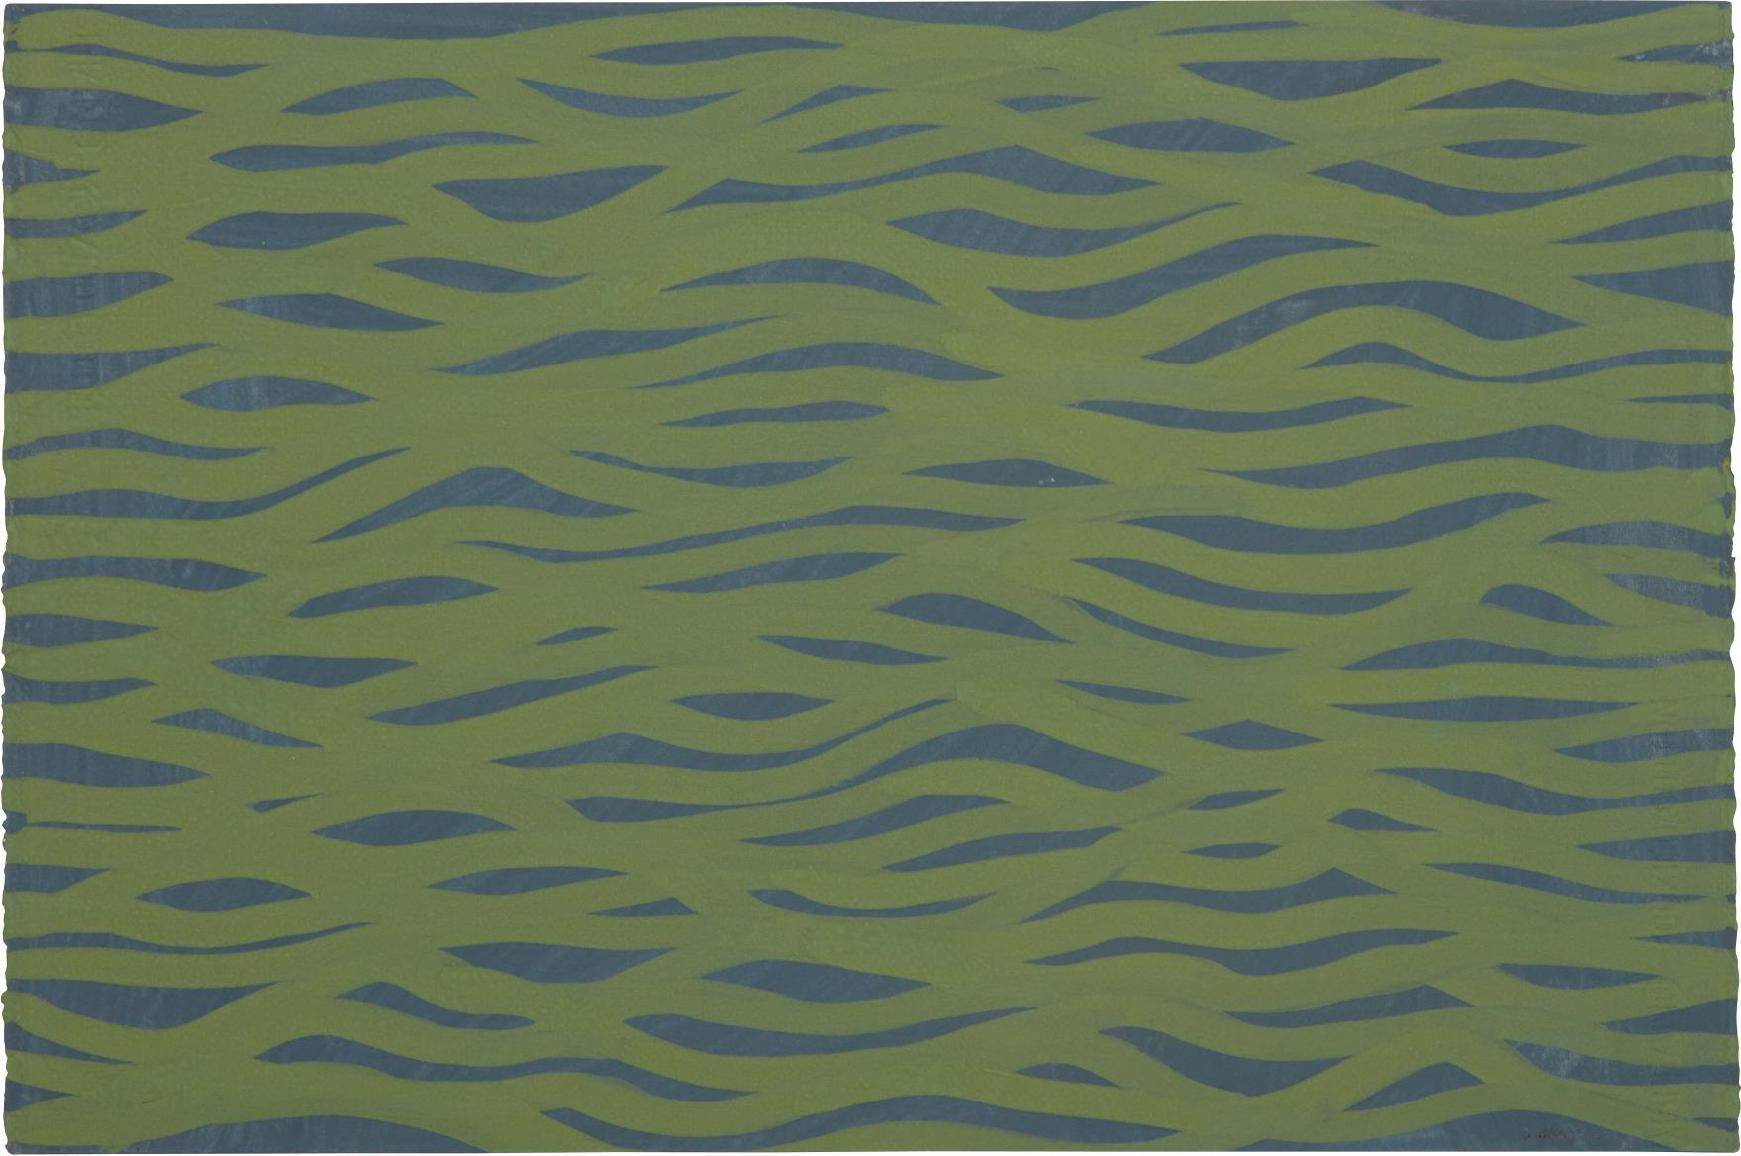 Sol LeWitt-Horizontal Brushstrokes (More Or Less)-2002